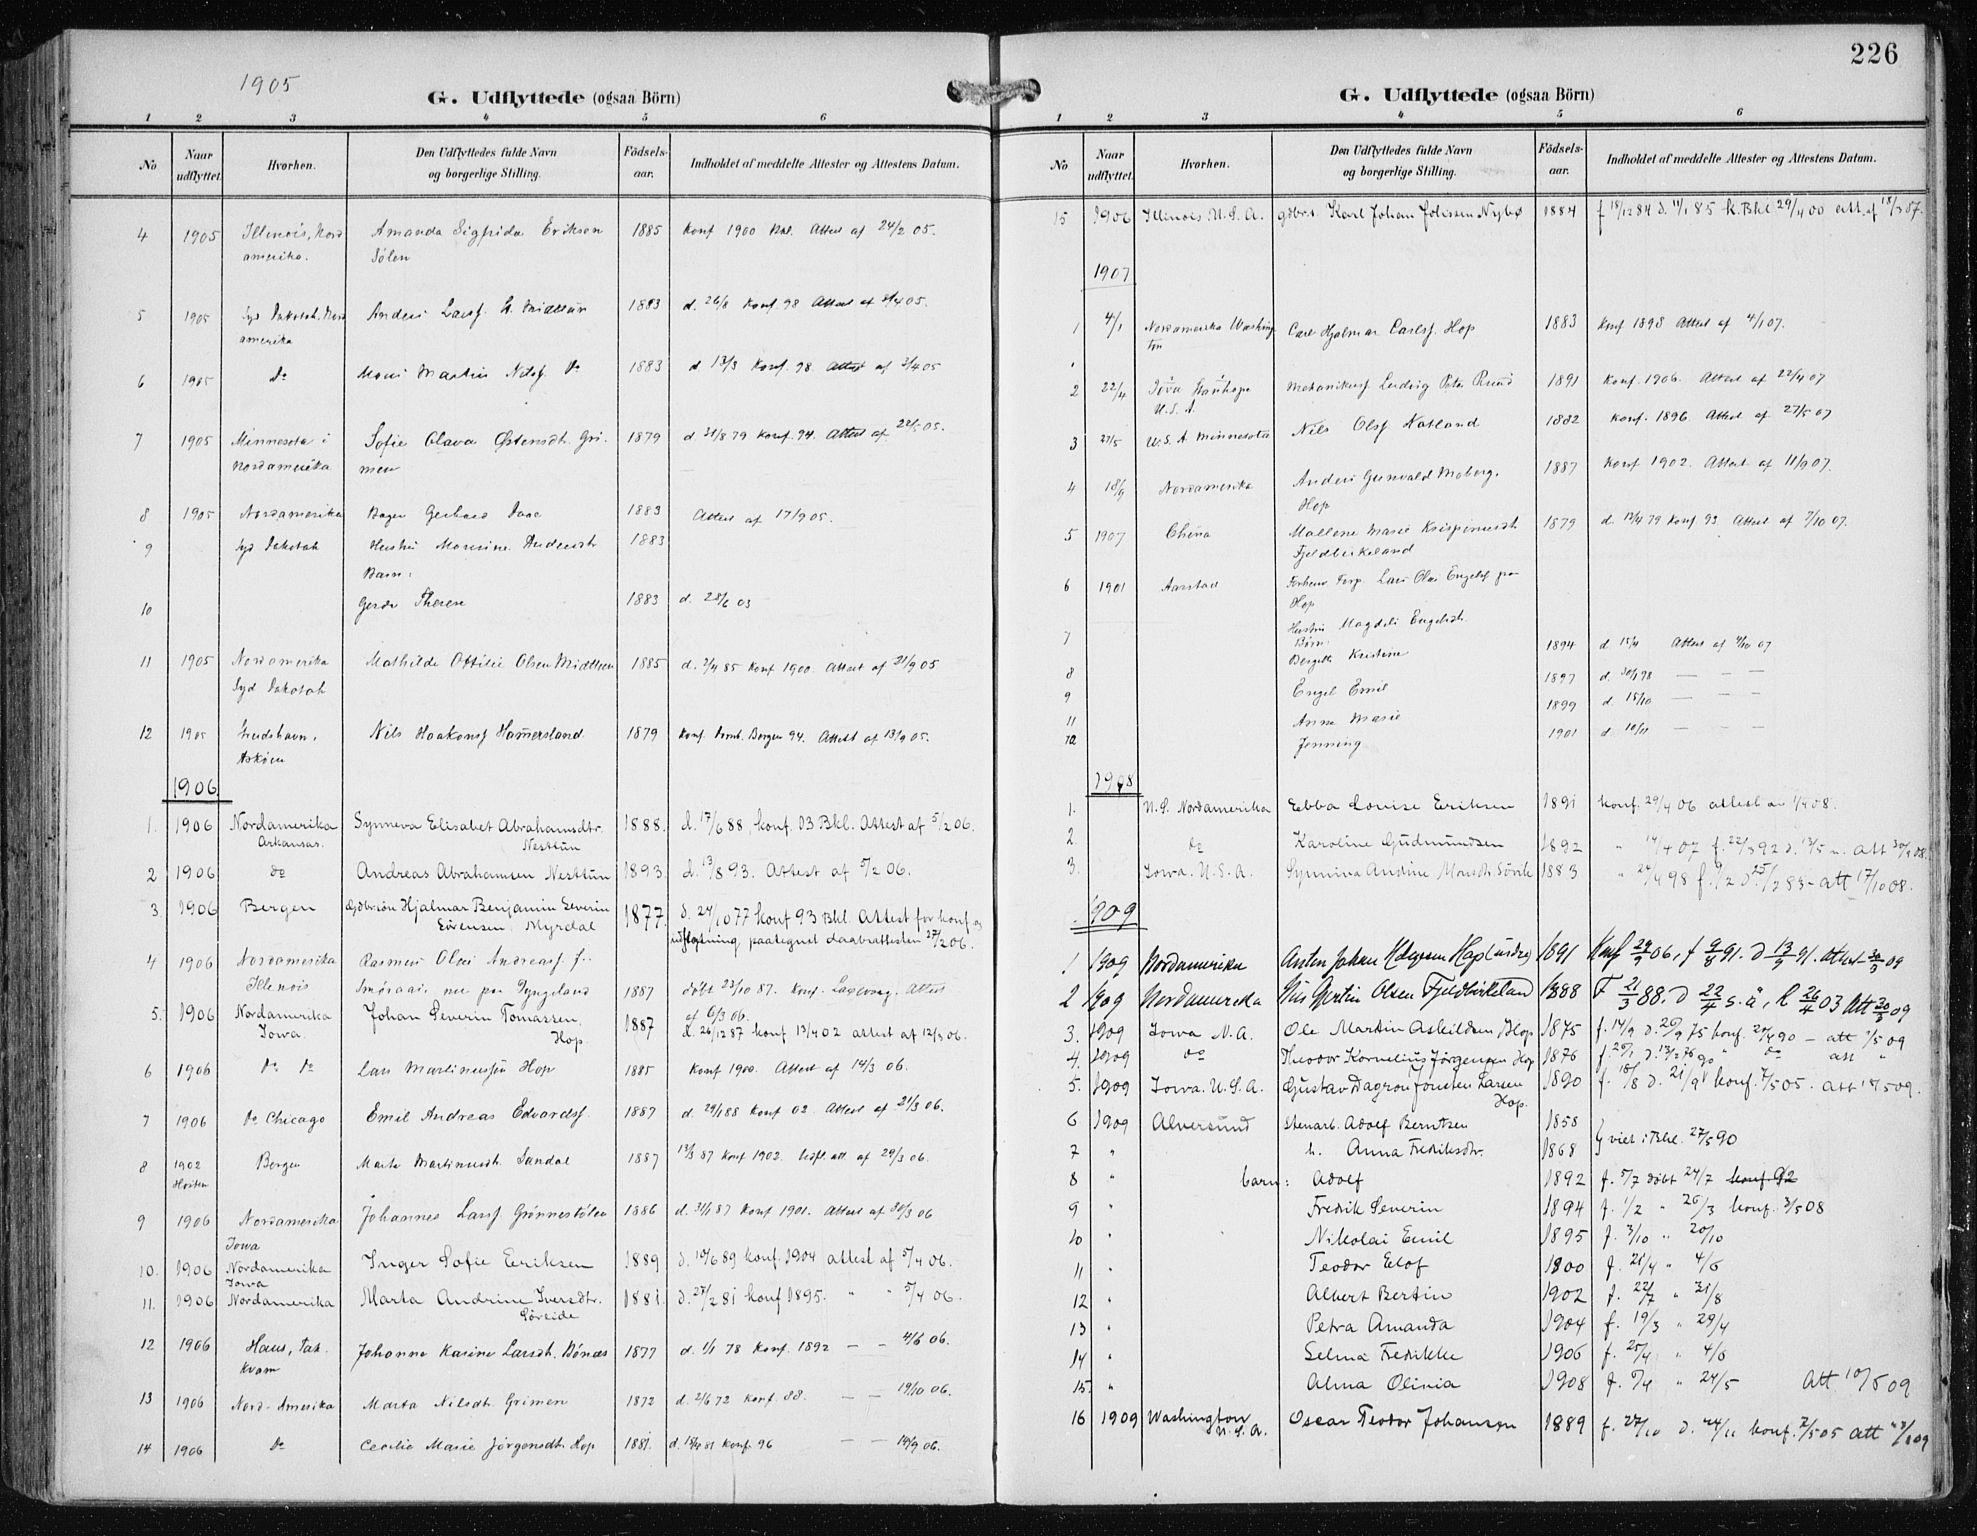 SAB, Fana Sokneprestembete, H/Haa/Haai/L0003: Ministerialbok nr. I 3, 1900-1912, s. 226